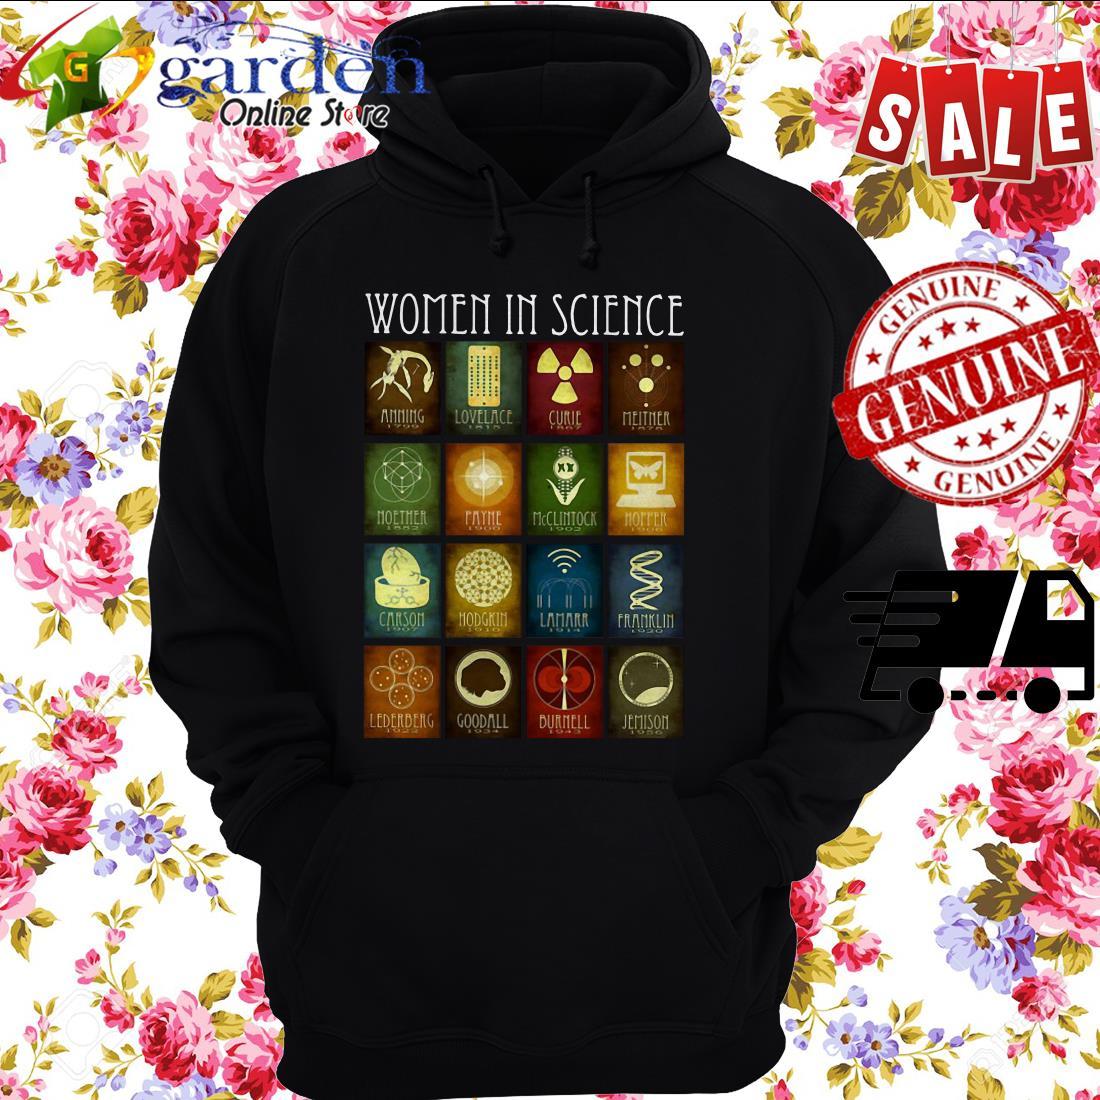 Women In Science Amming Lovelace Curie hoodie